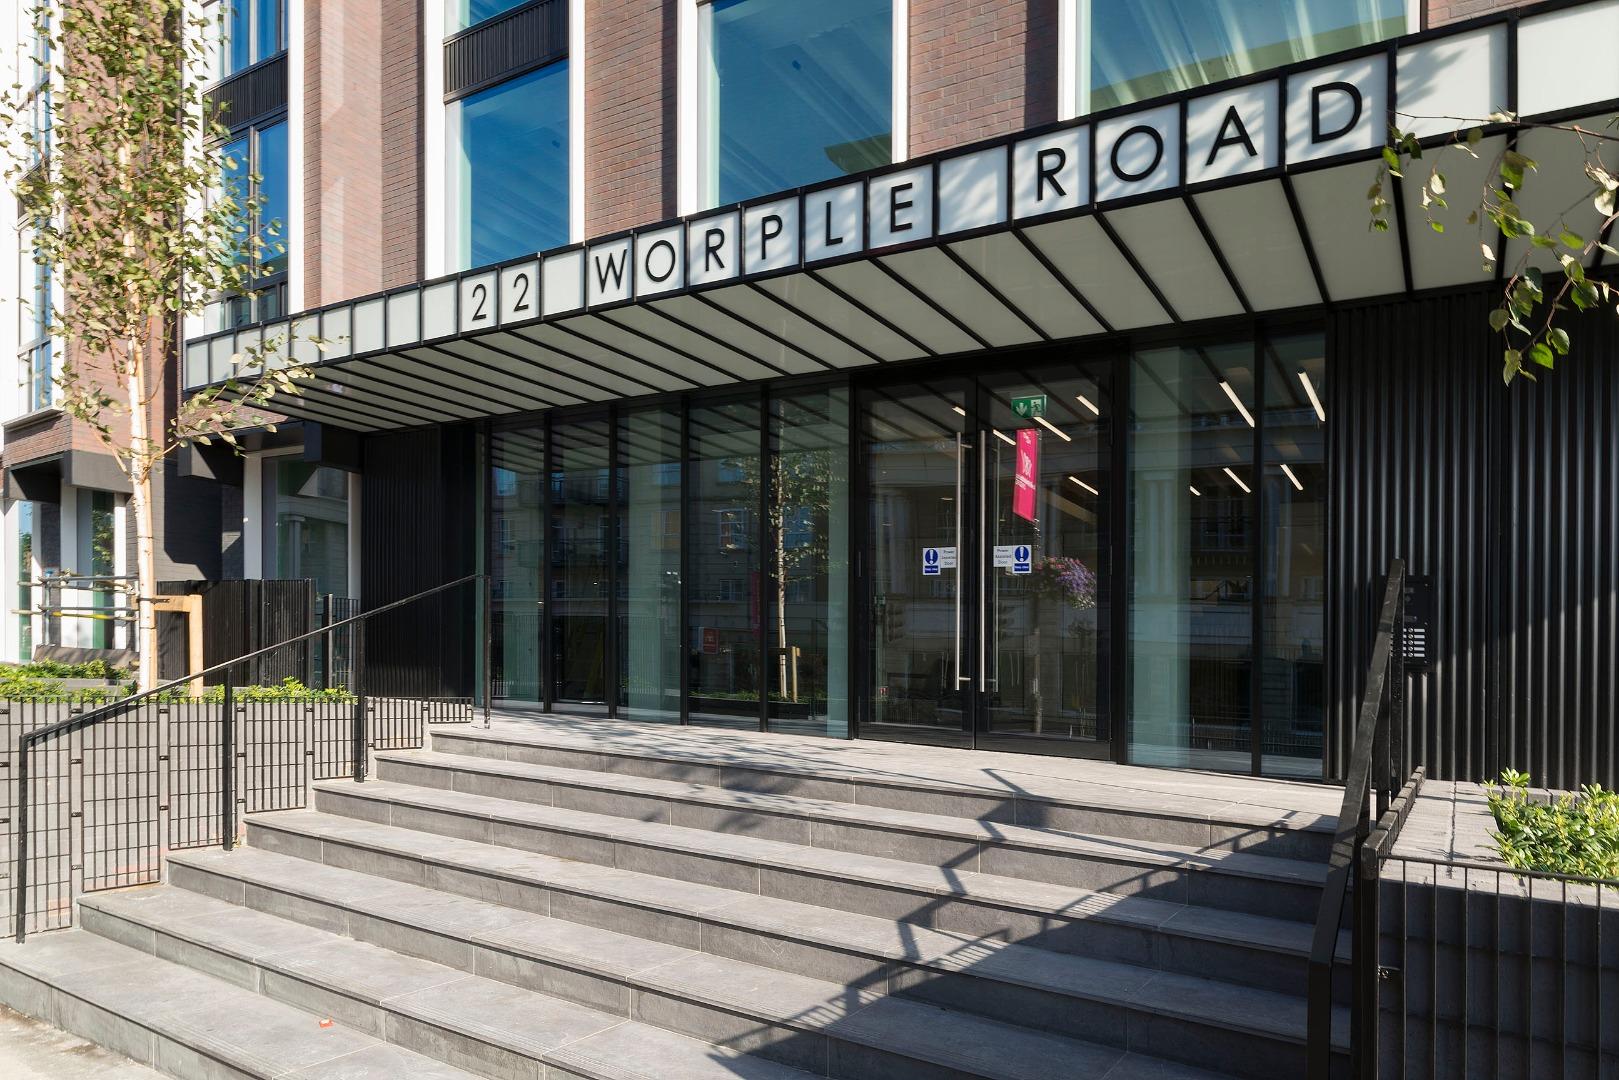 22 Worple Road Collins Construction